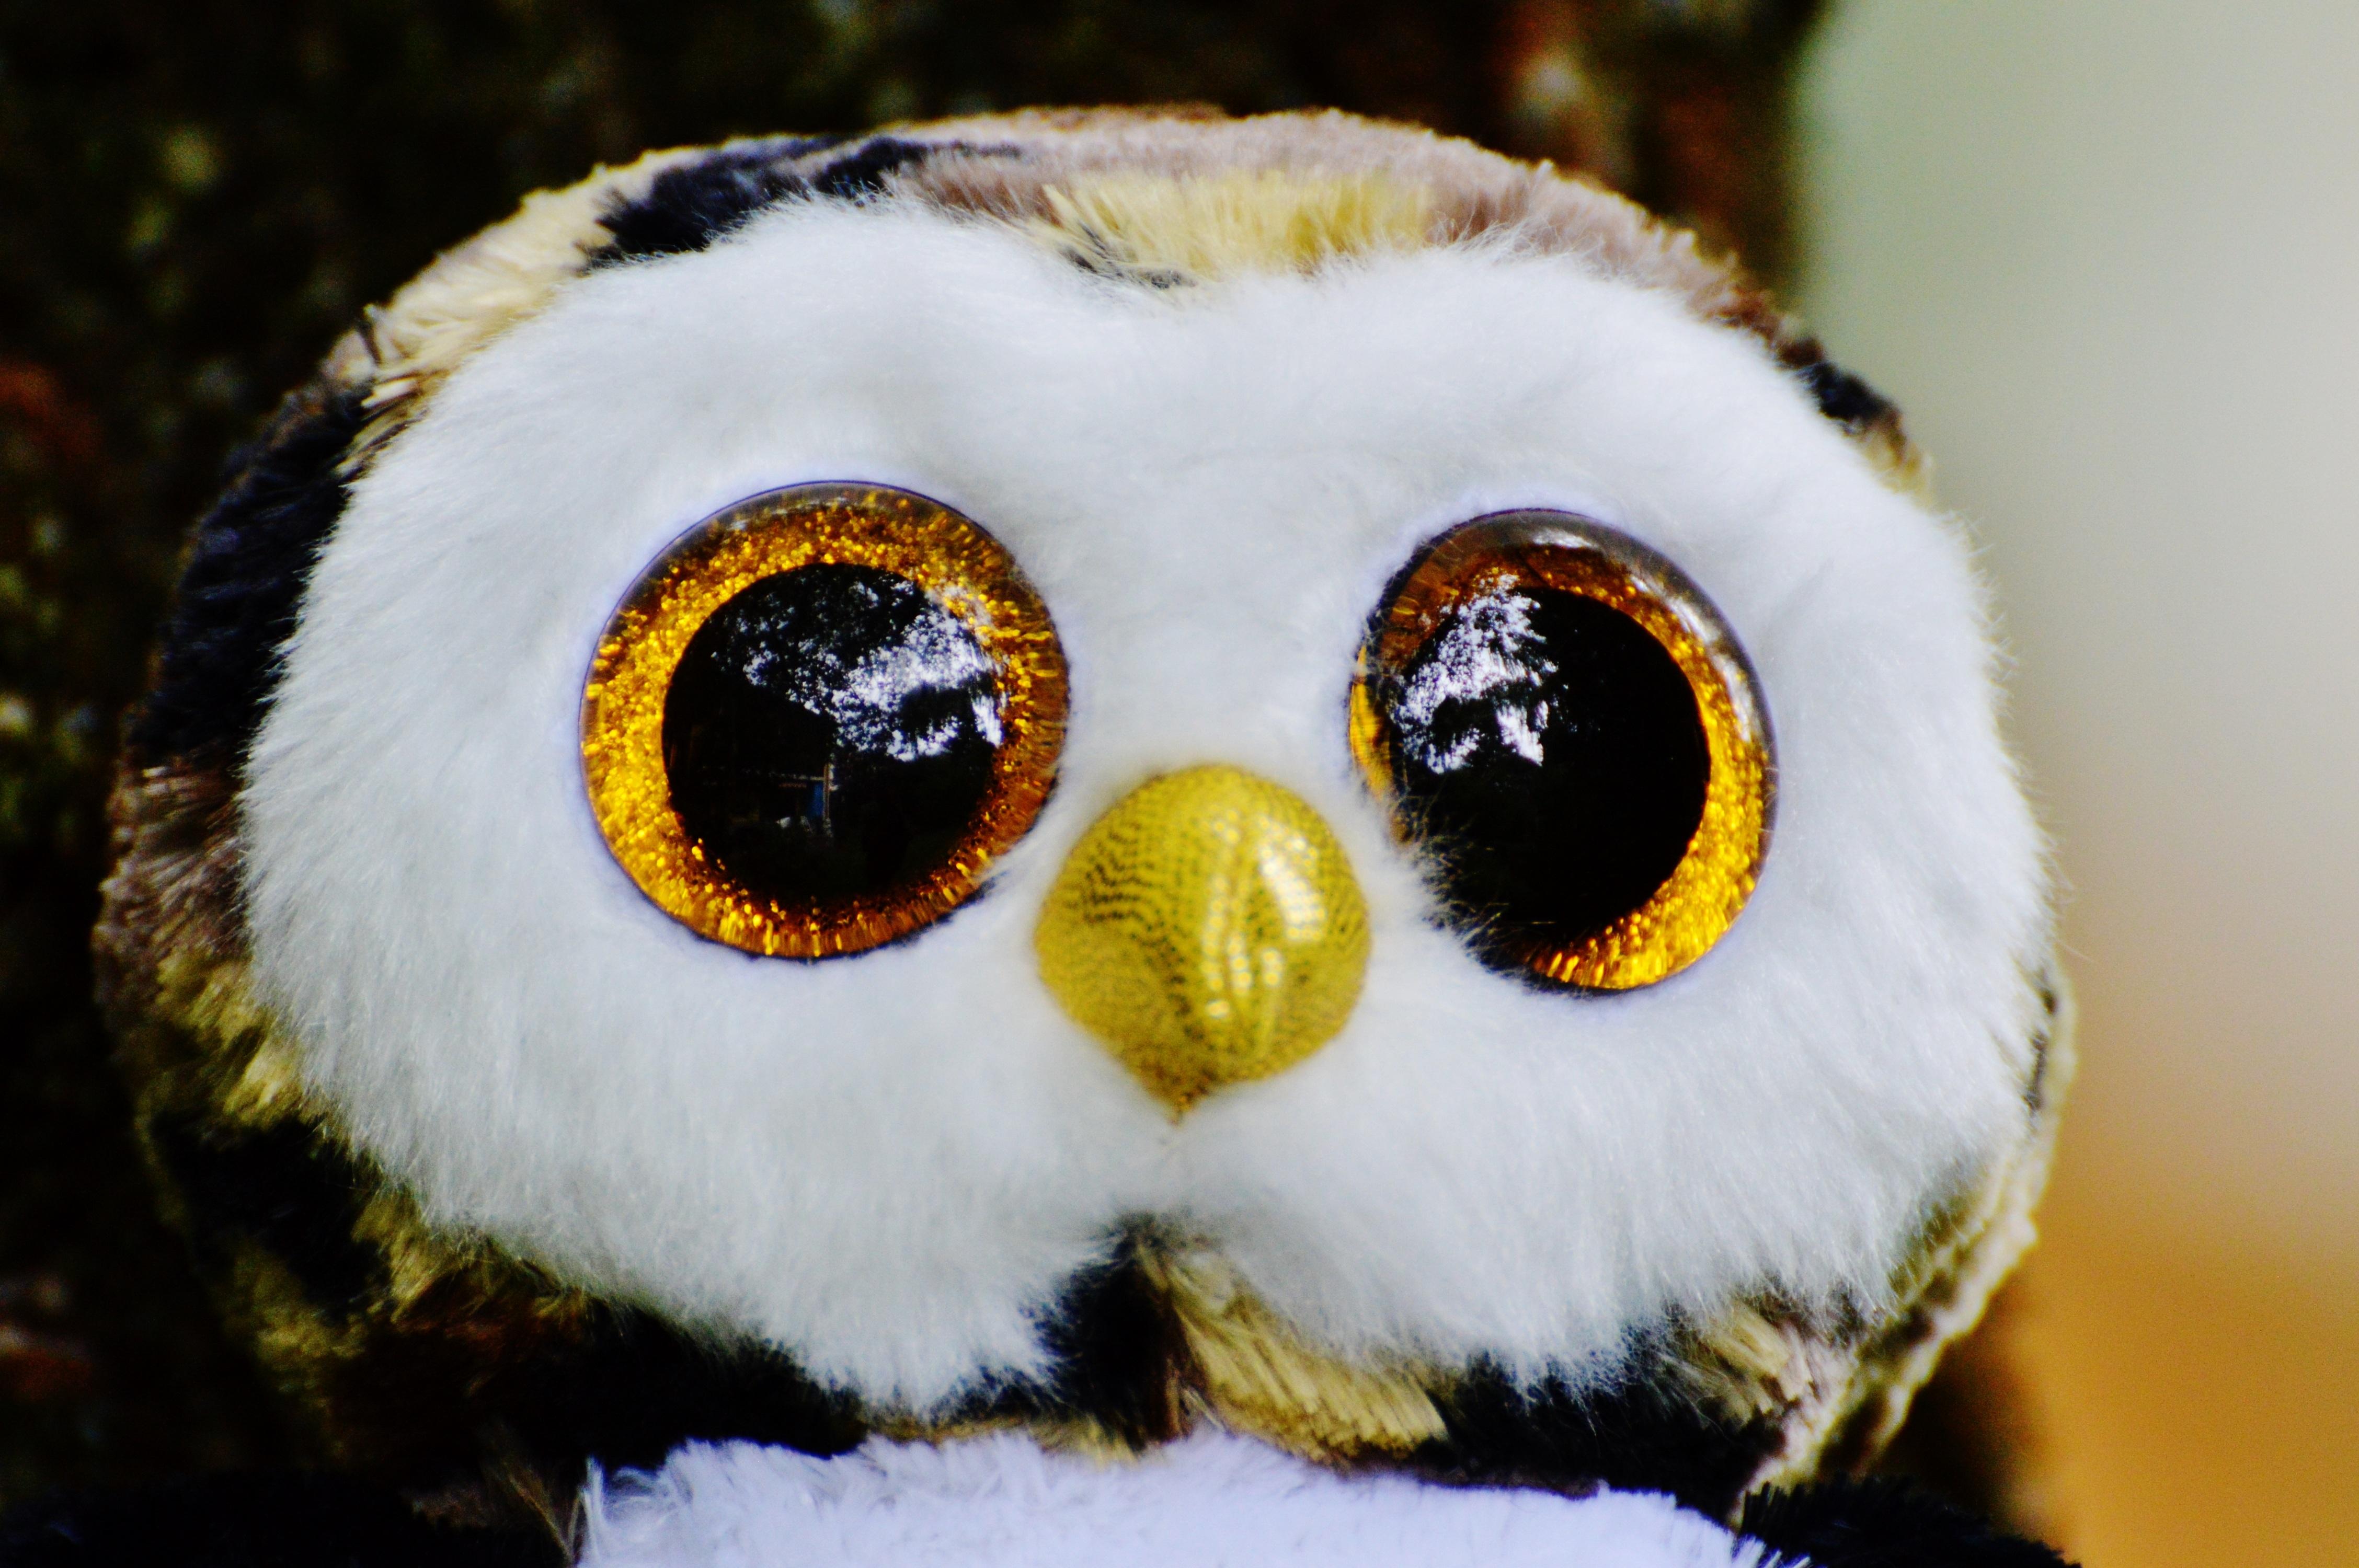 750 Koleksi Gambar Burung Hantu Yg Lucu HD